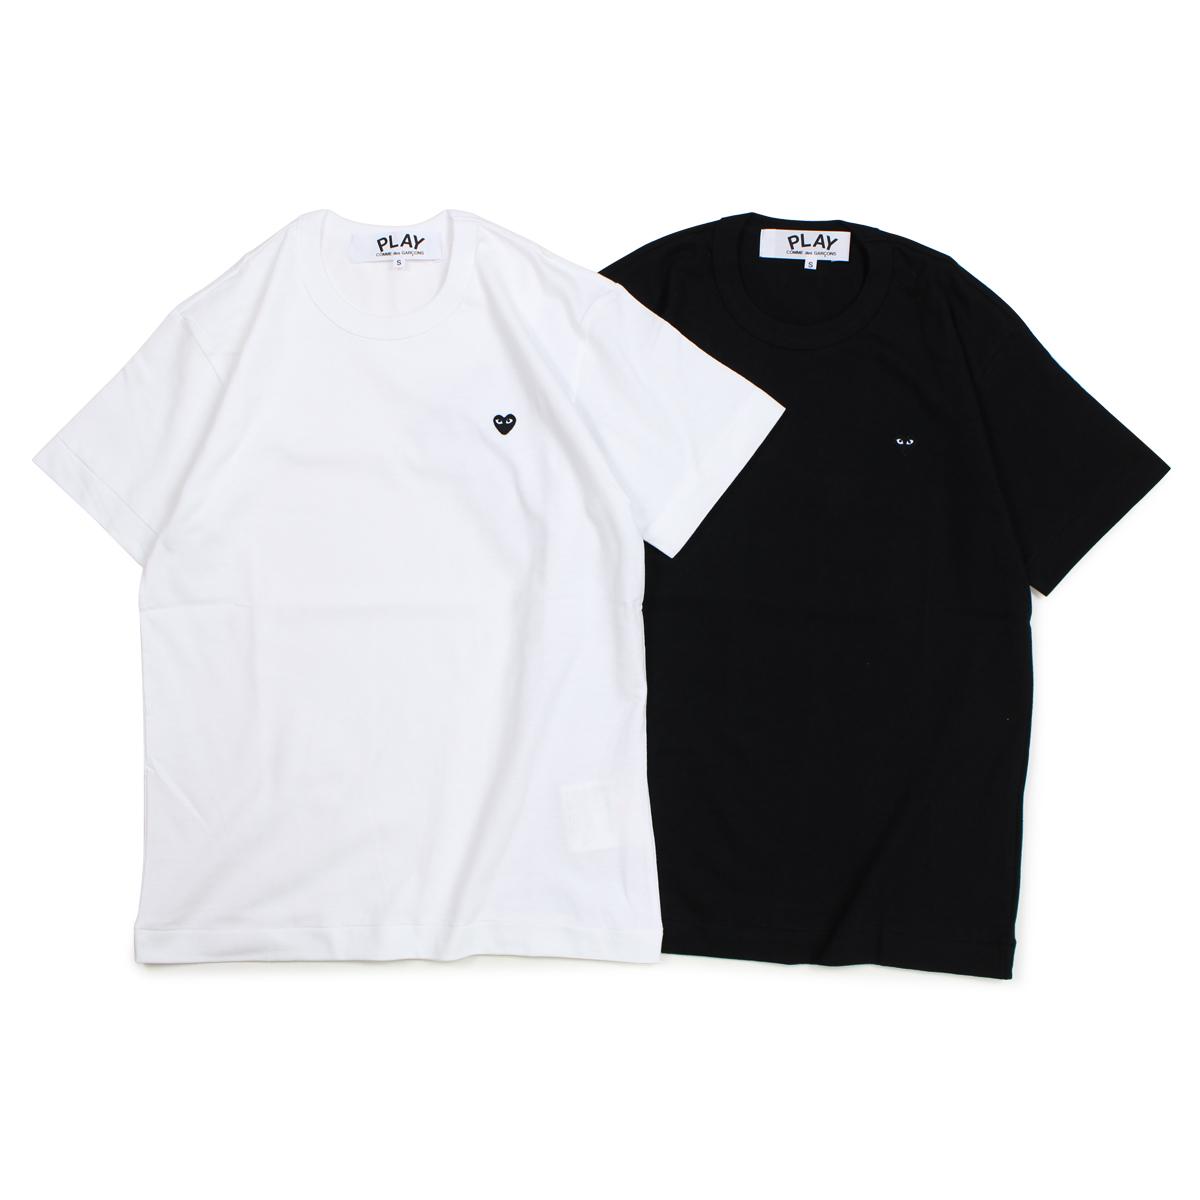 PLAY COMME des GARCONS BLACK HEART T-SHIRT コムデギャルソン Tシャツ 半袖 メンズ ブラック ホワイト AZT202 [10/3 新入荷] [1810]